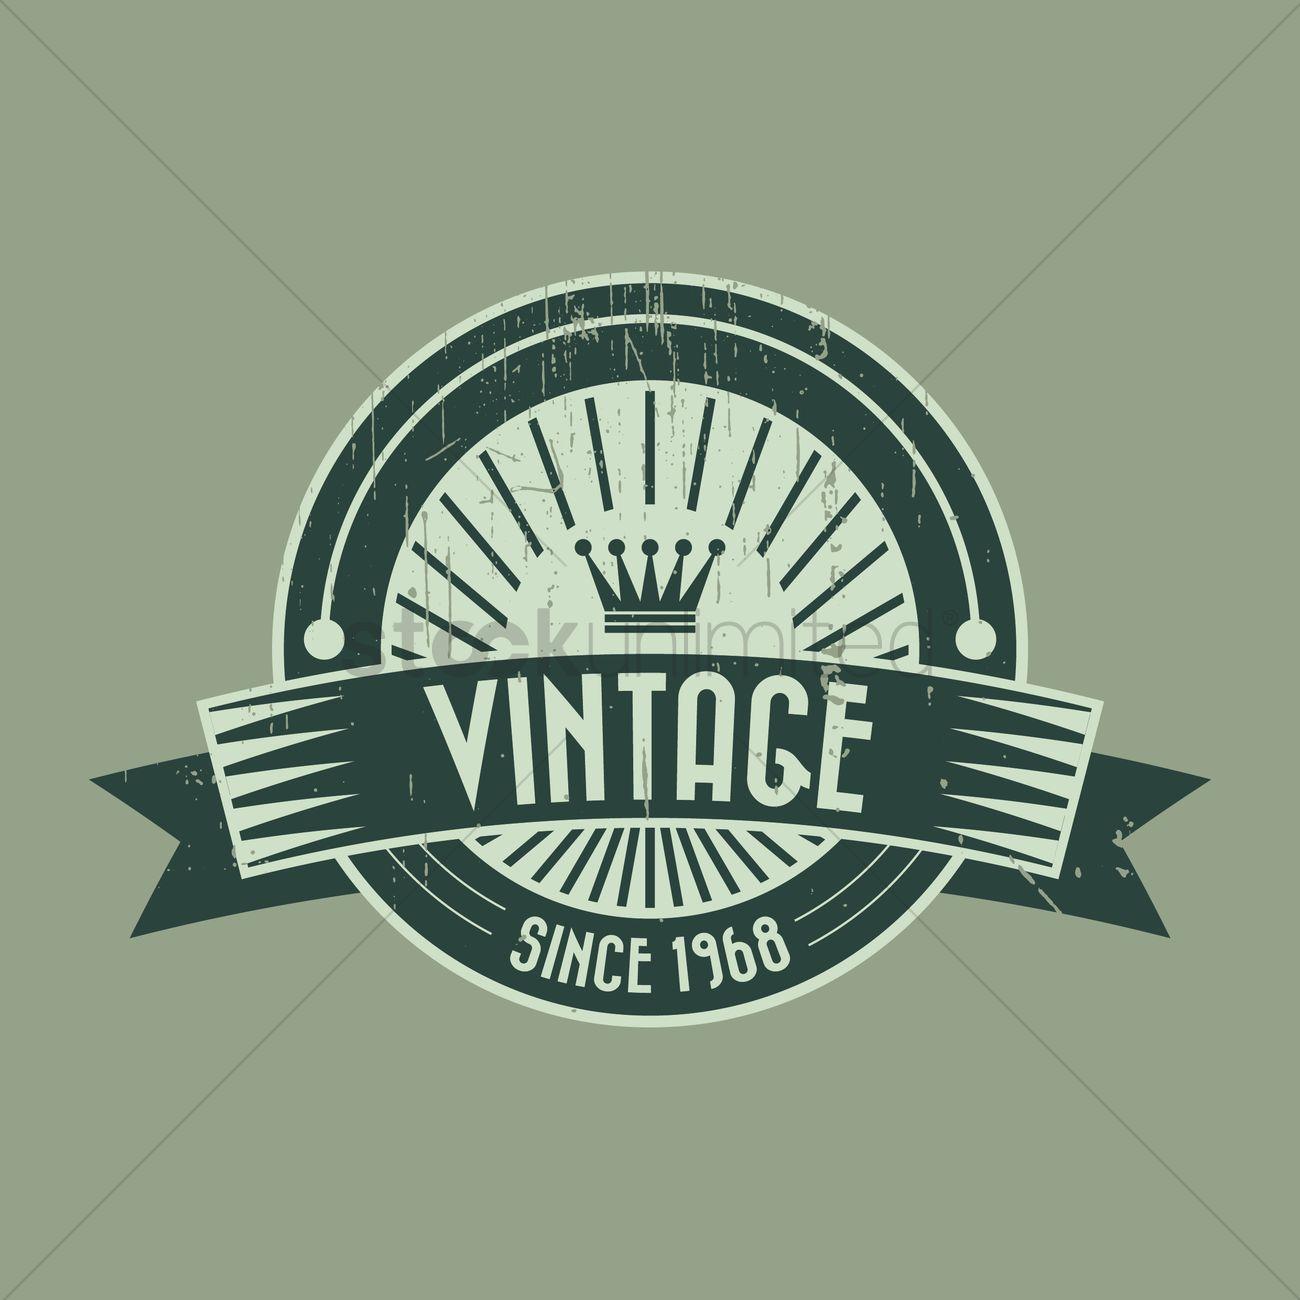 Vintage product label design Vector Image - 1444023 ...